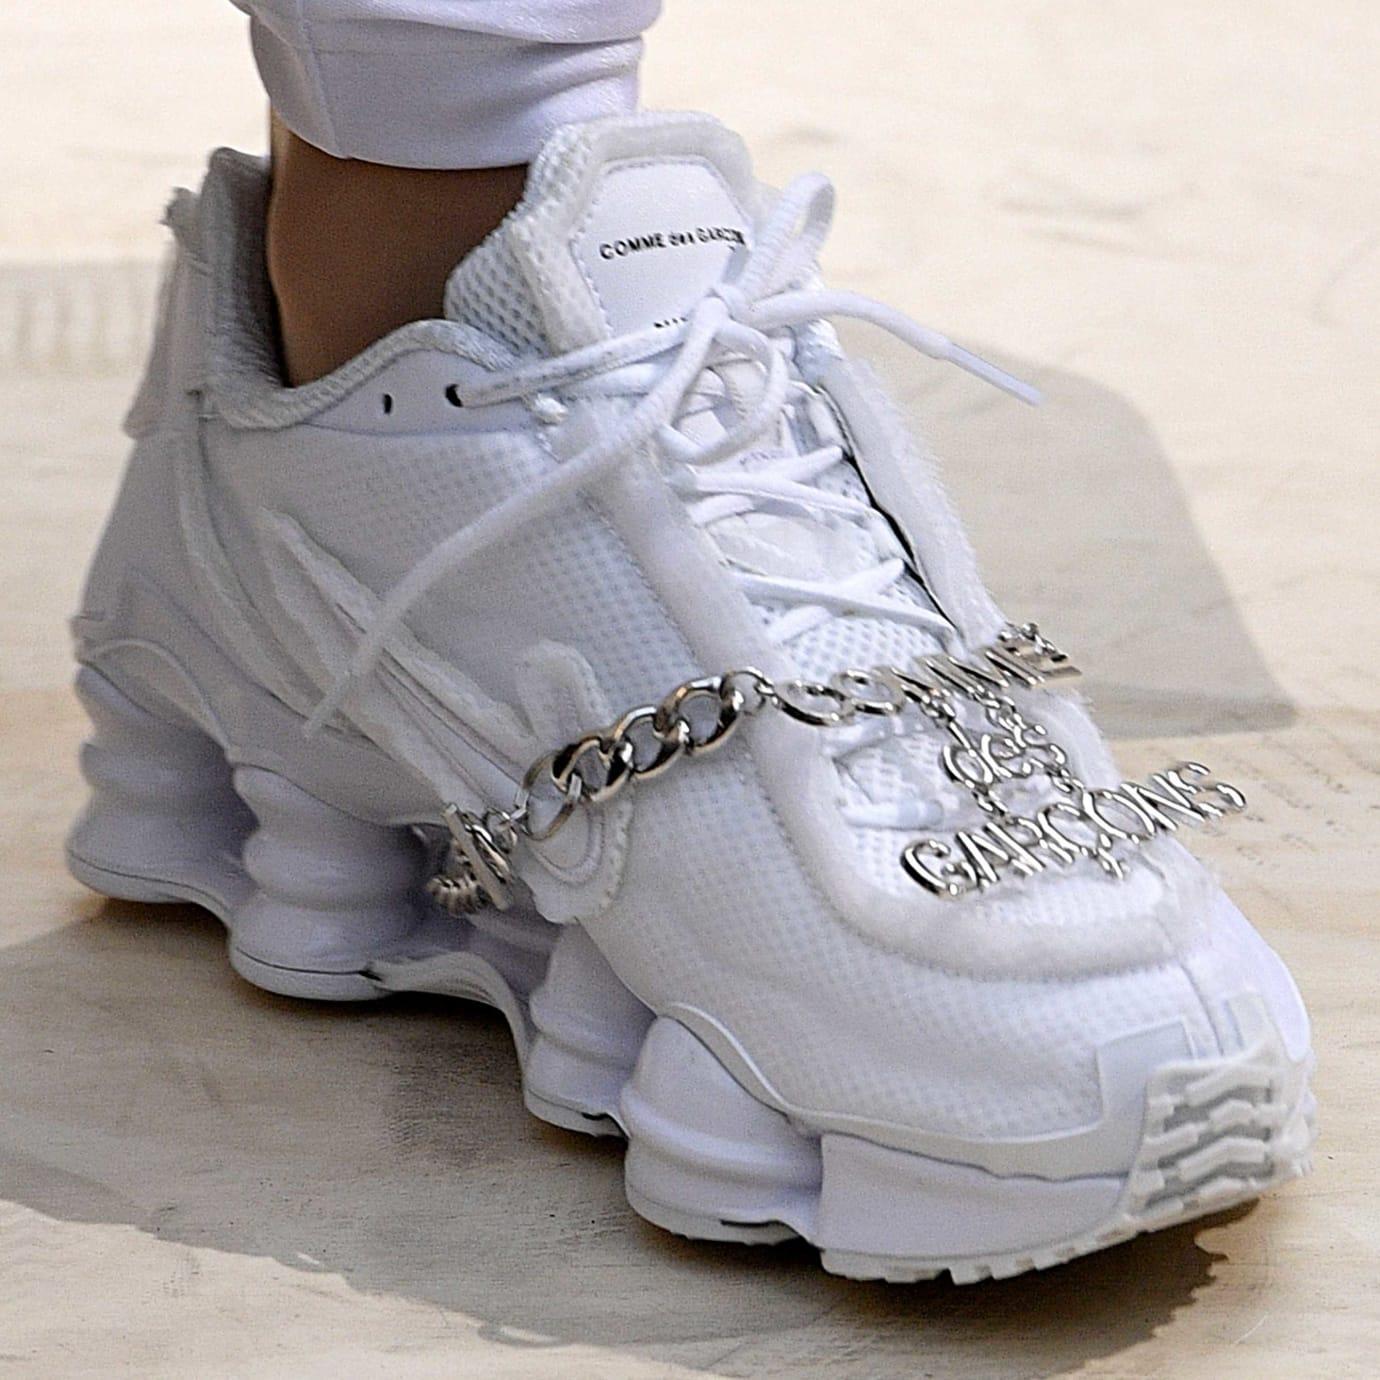 Men's Medial X Nike White Come Shox qwg7fw0